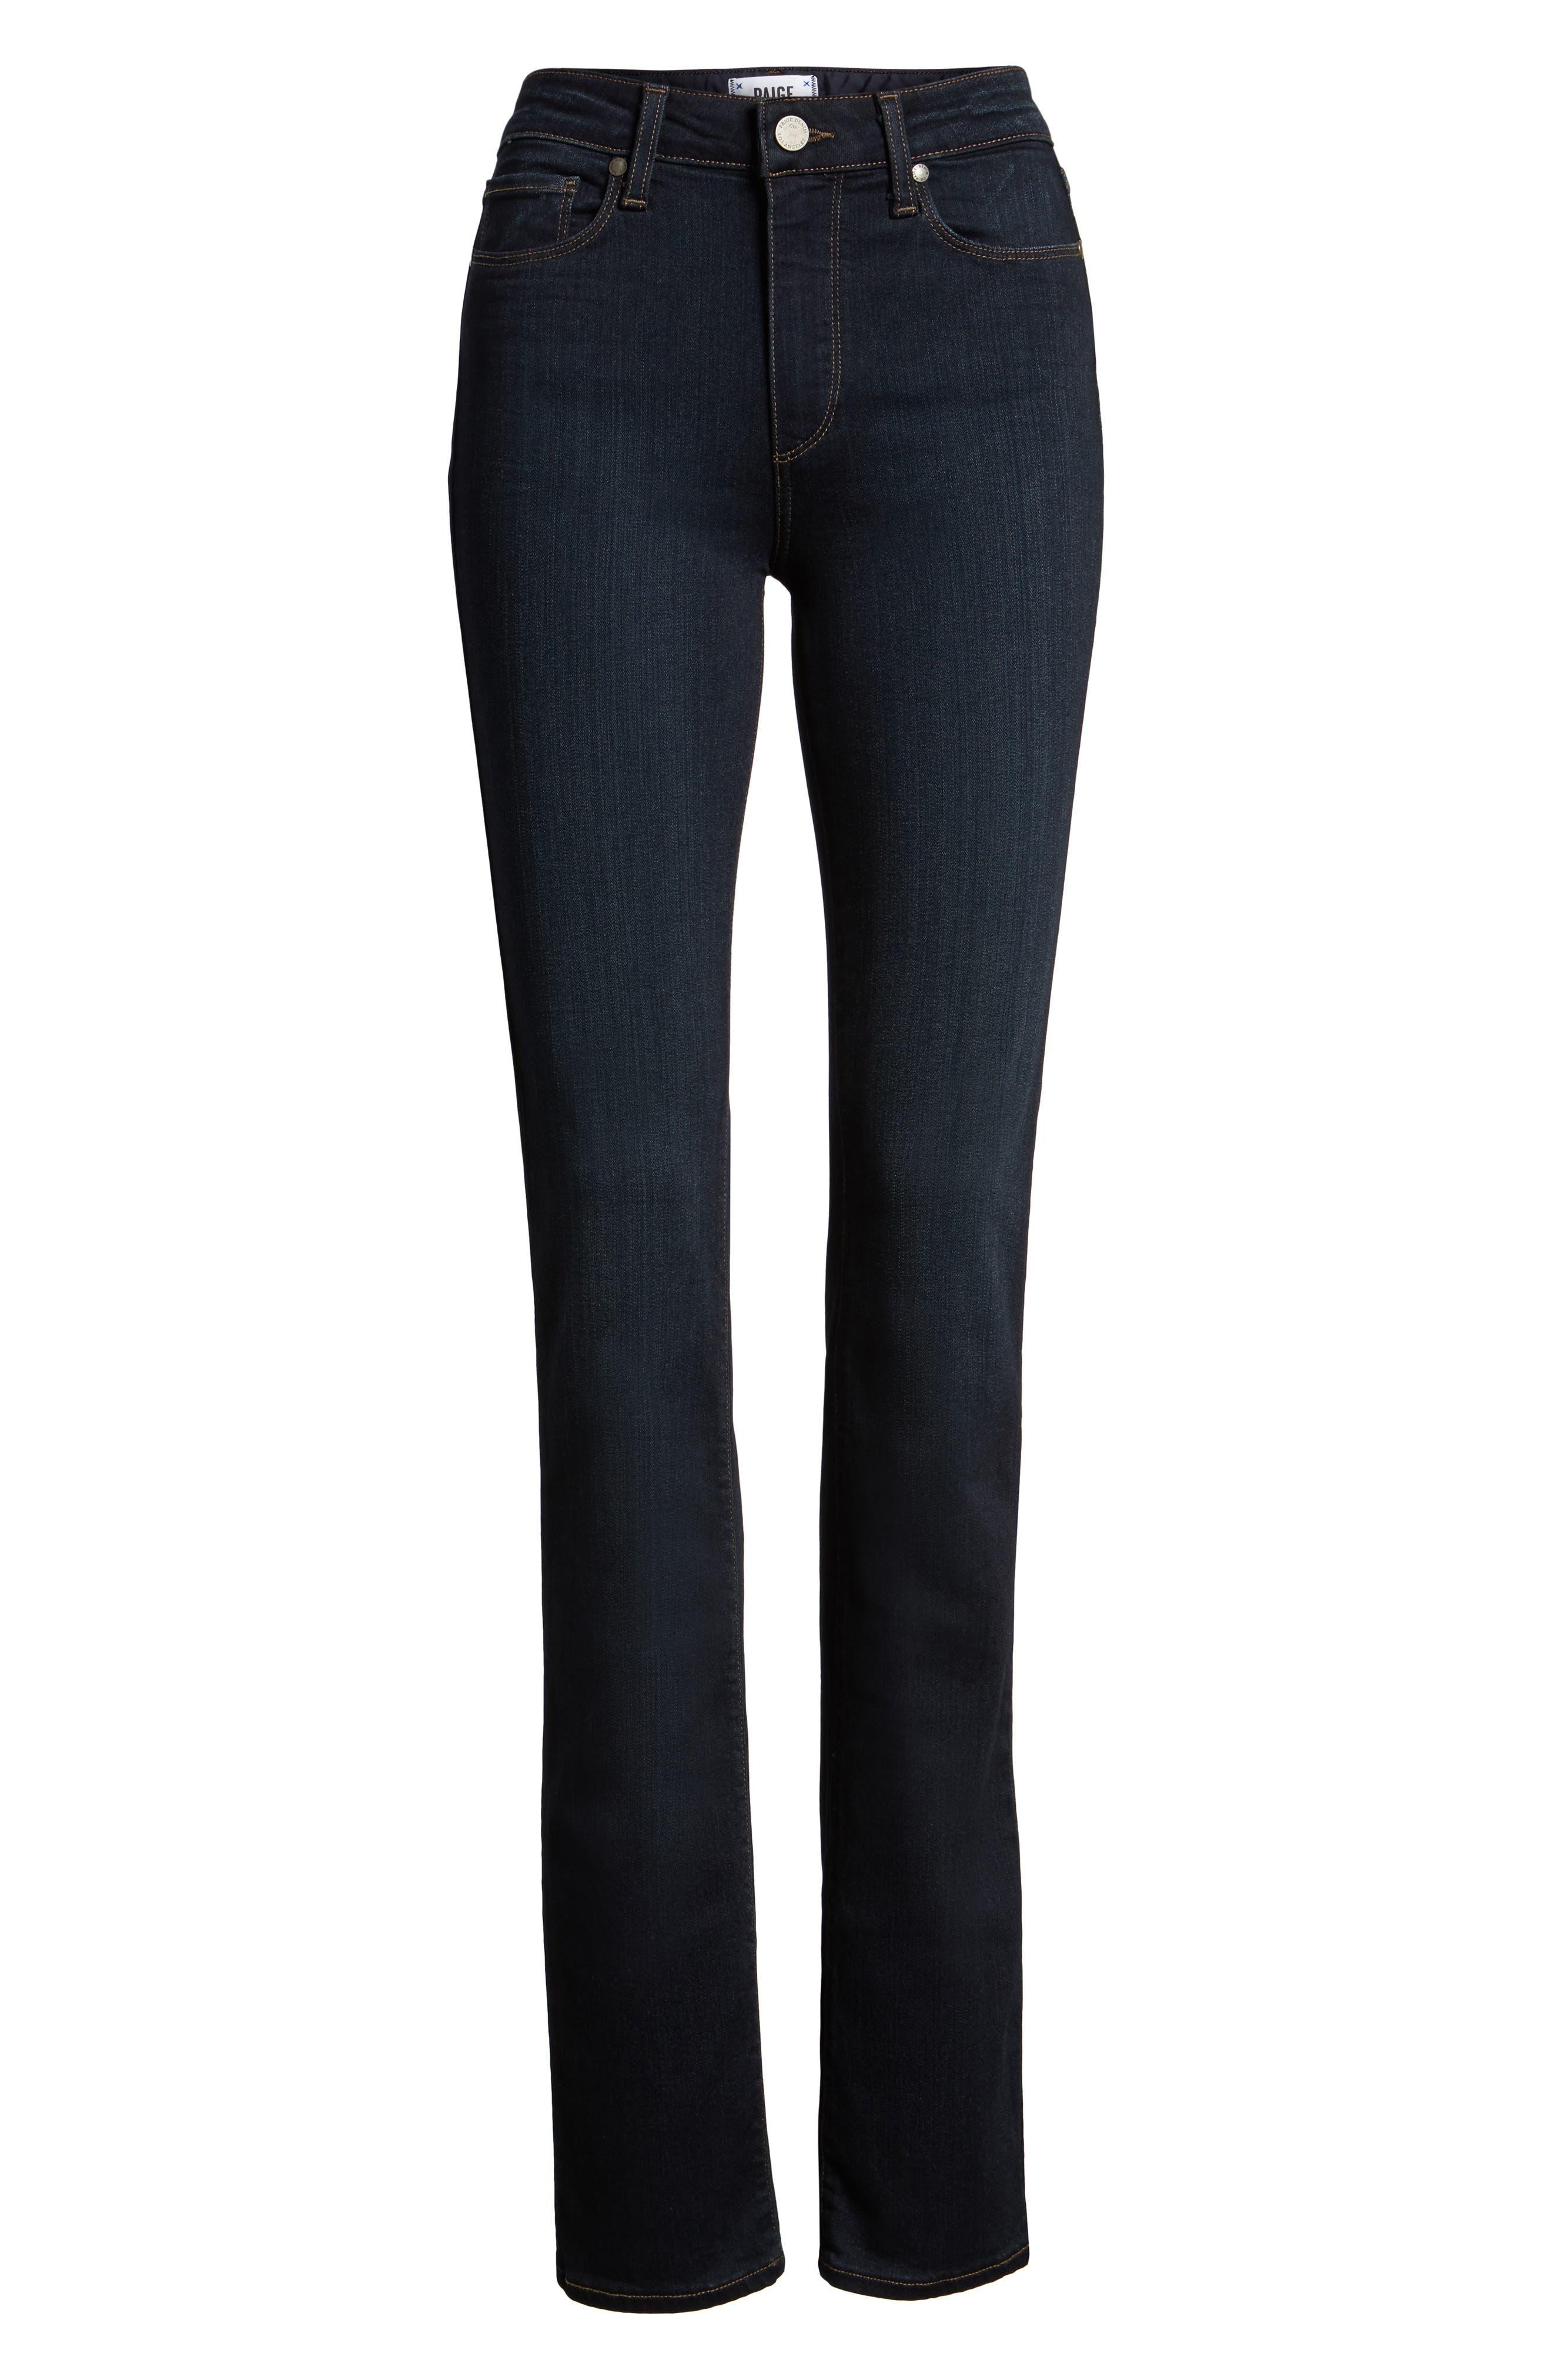 Transcend - Hoxton High Waist Straight Jeans,                         Main,                         color, MONA